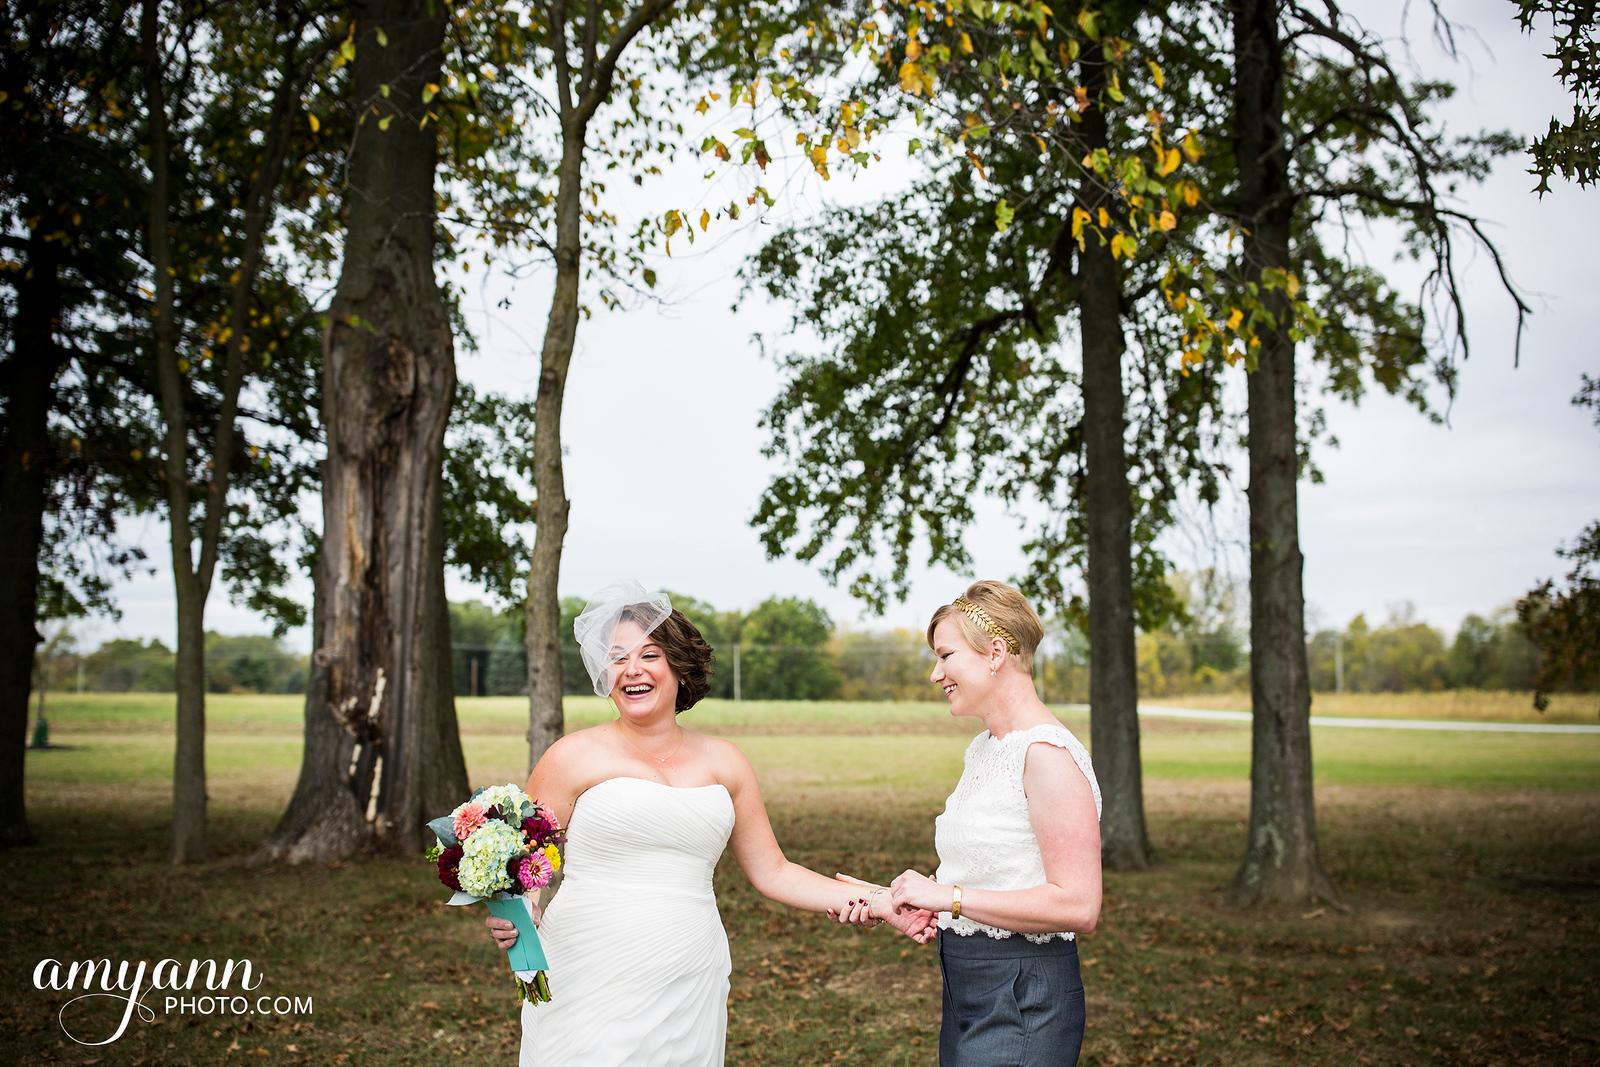 lindyangie_weddingblog25